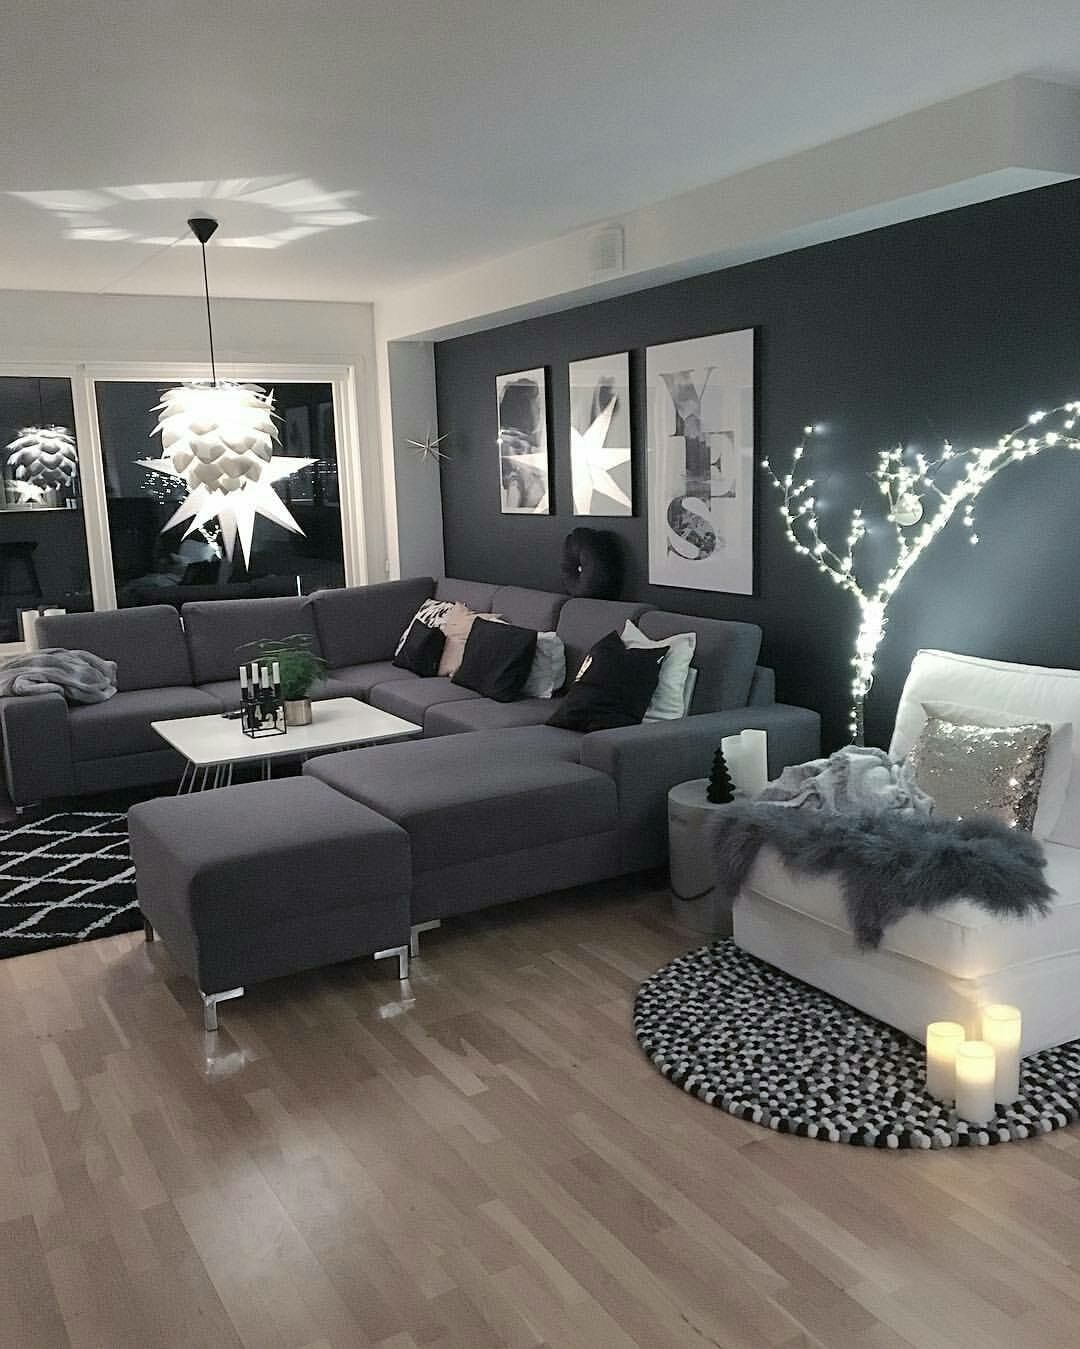 Modern Sectional Sofa Small Living Room Decor Black Living Room